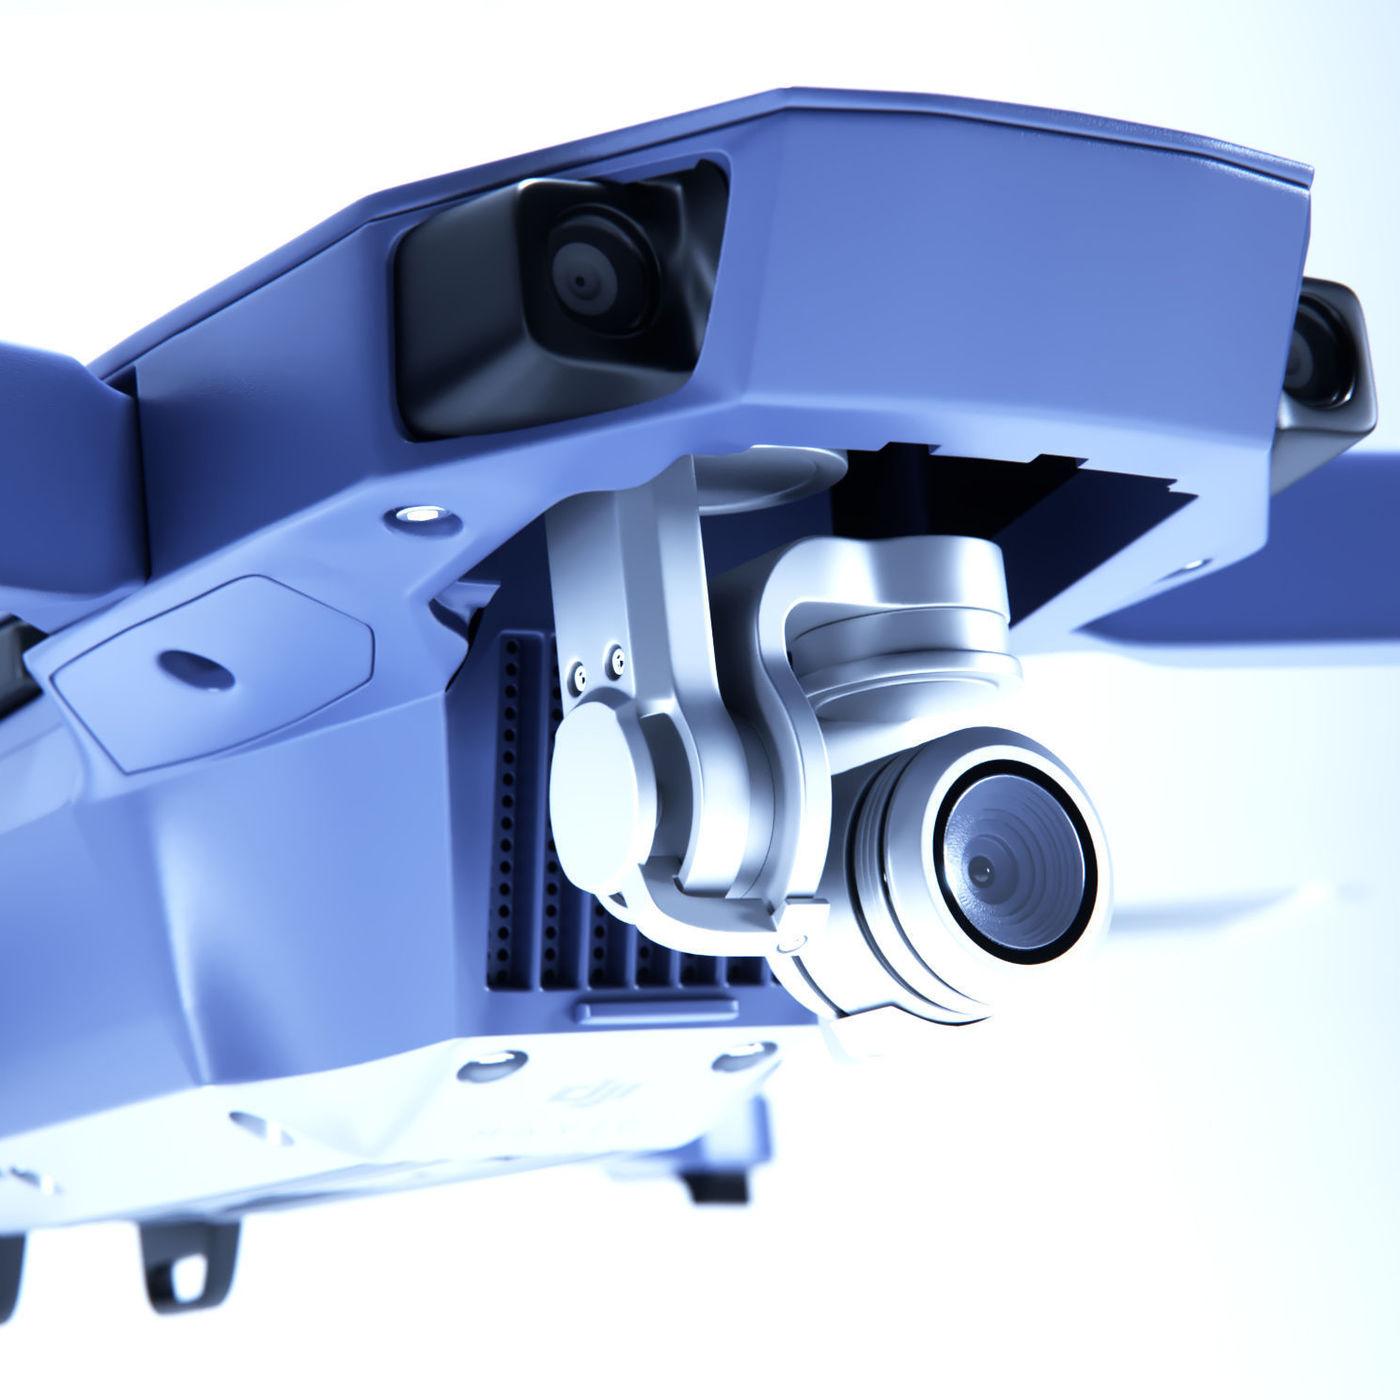 mavic pro quadcopter